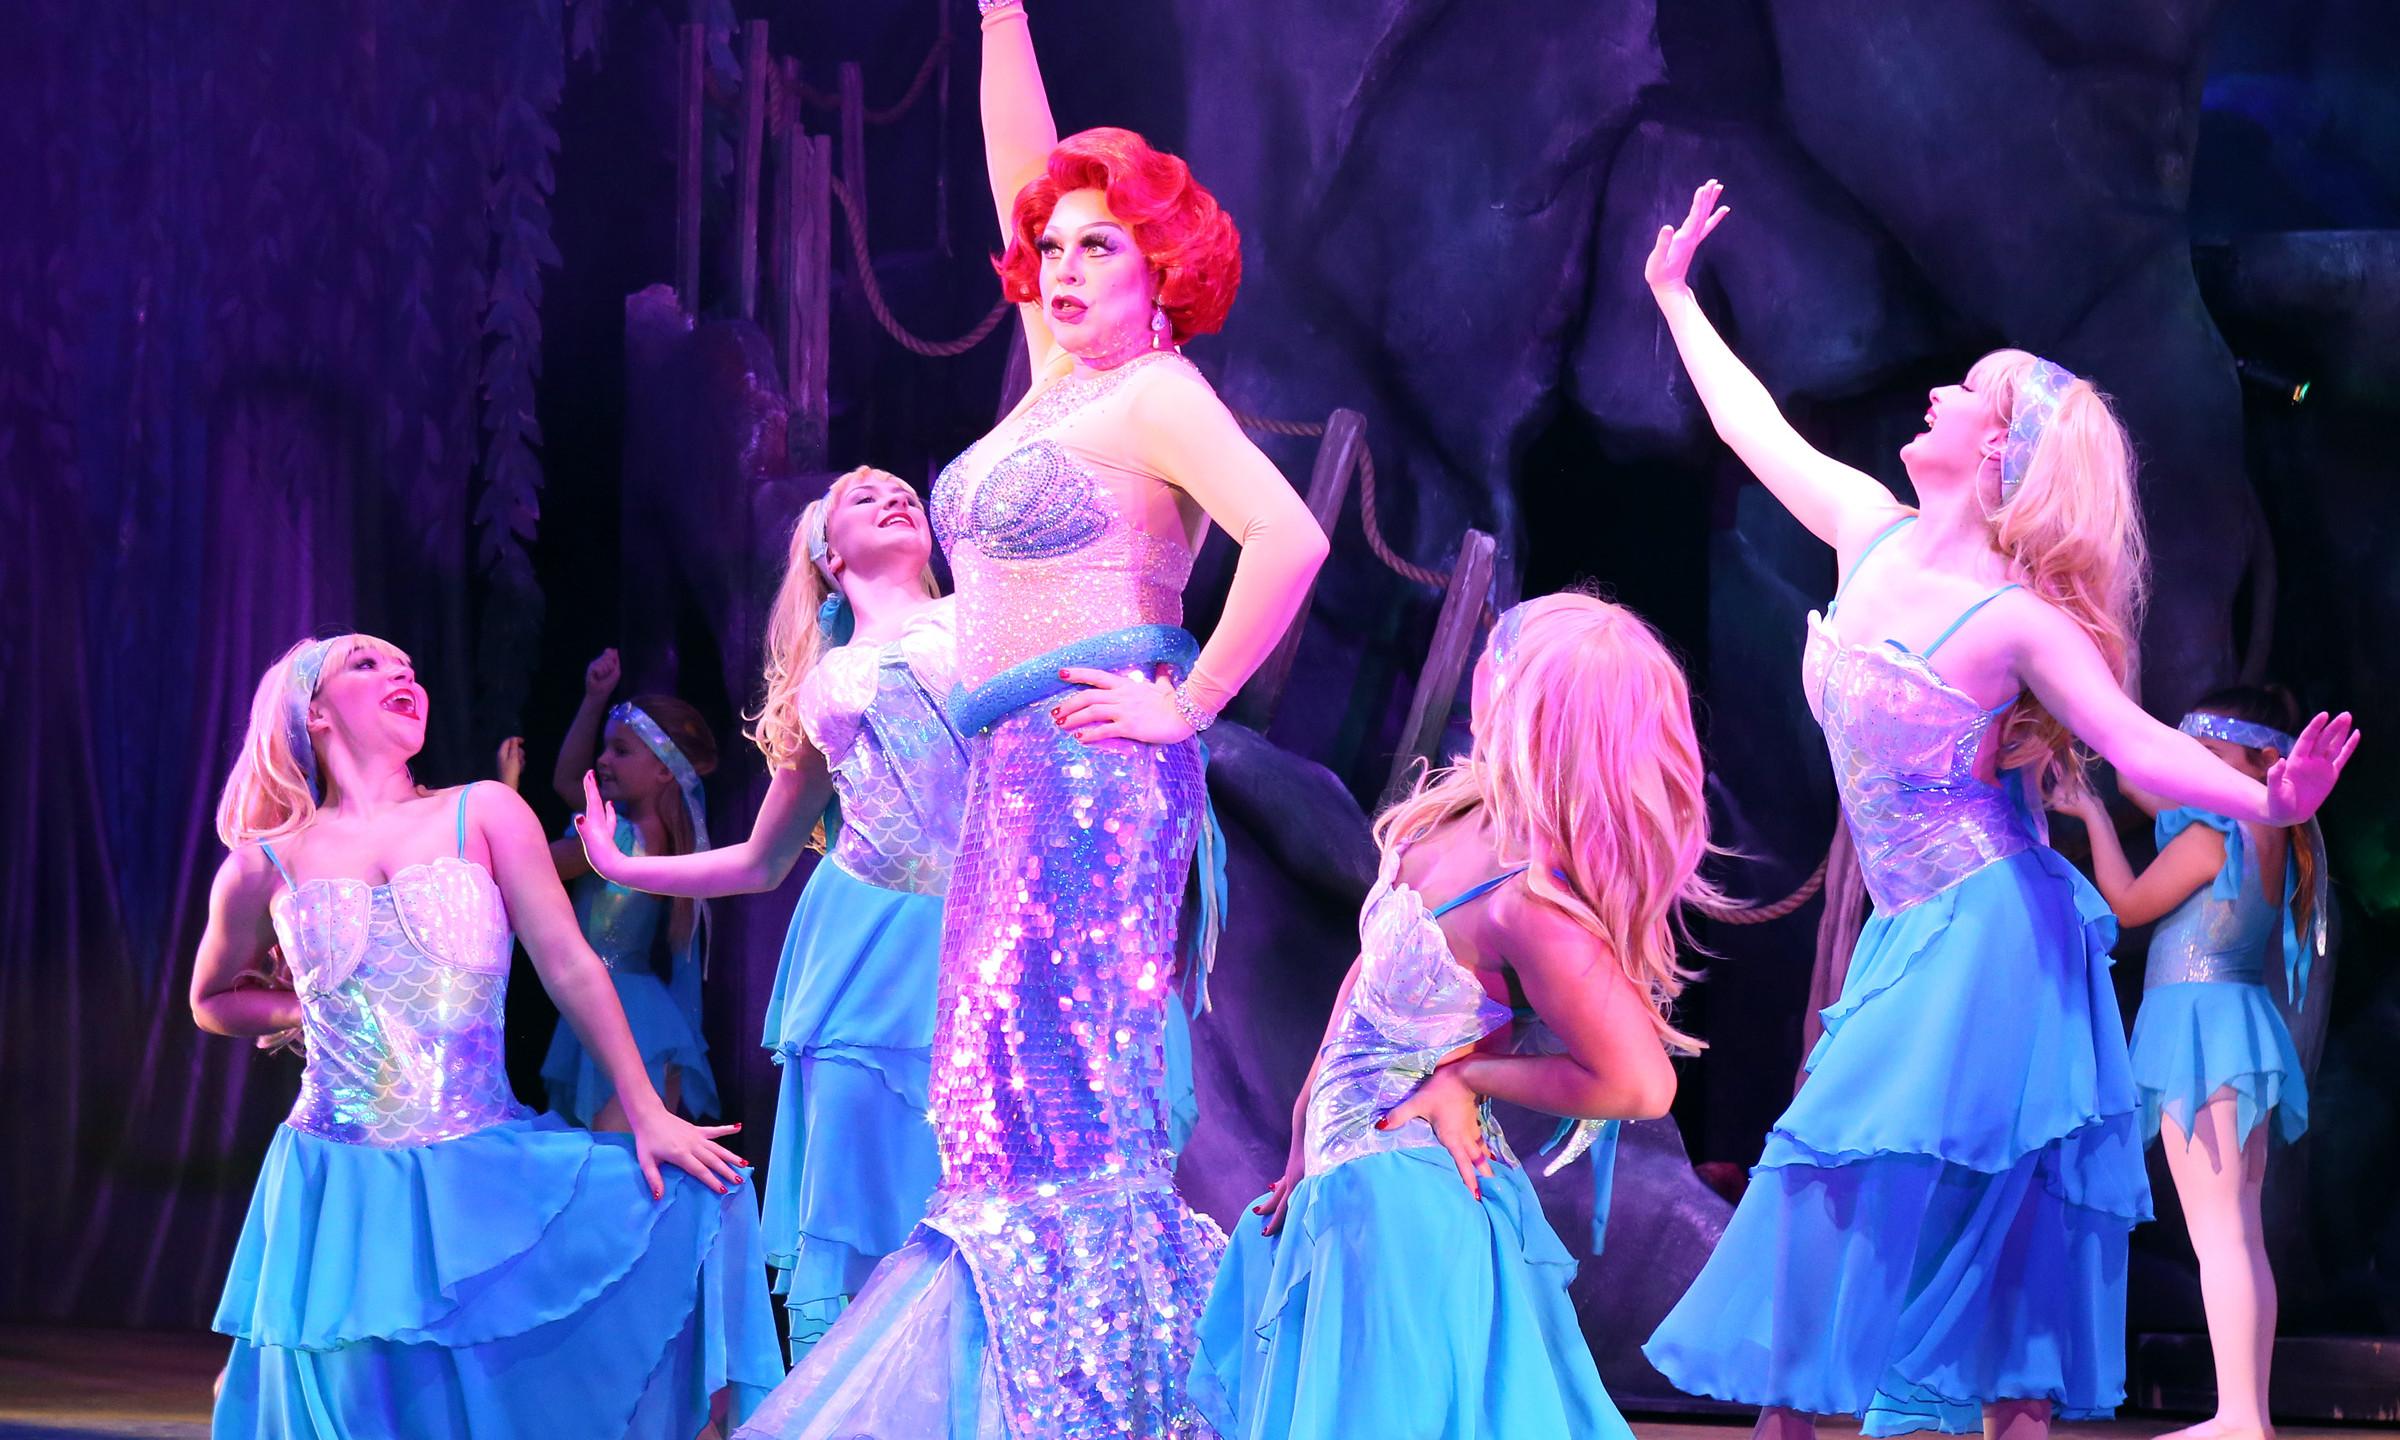 La Voix and mermaids